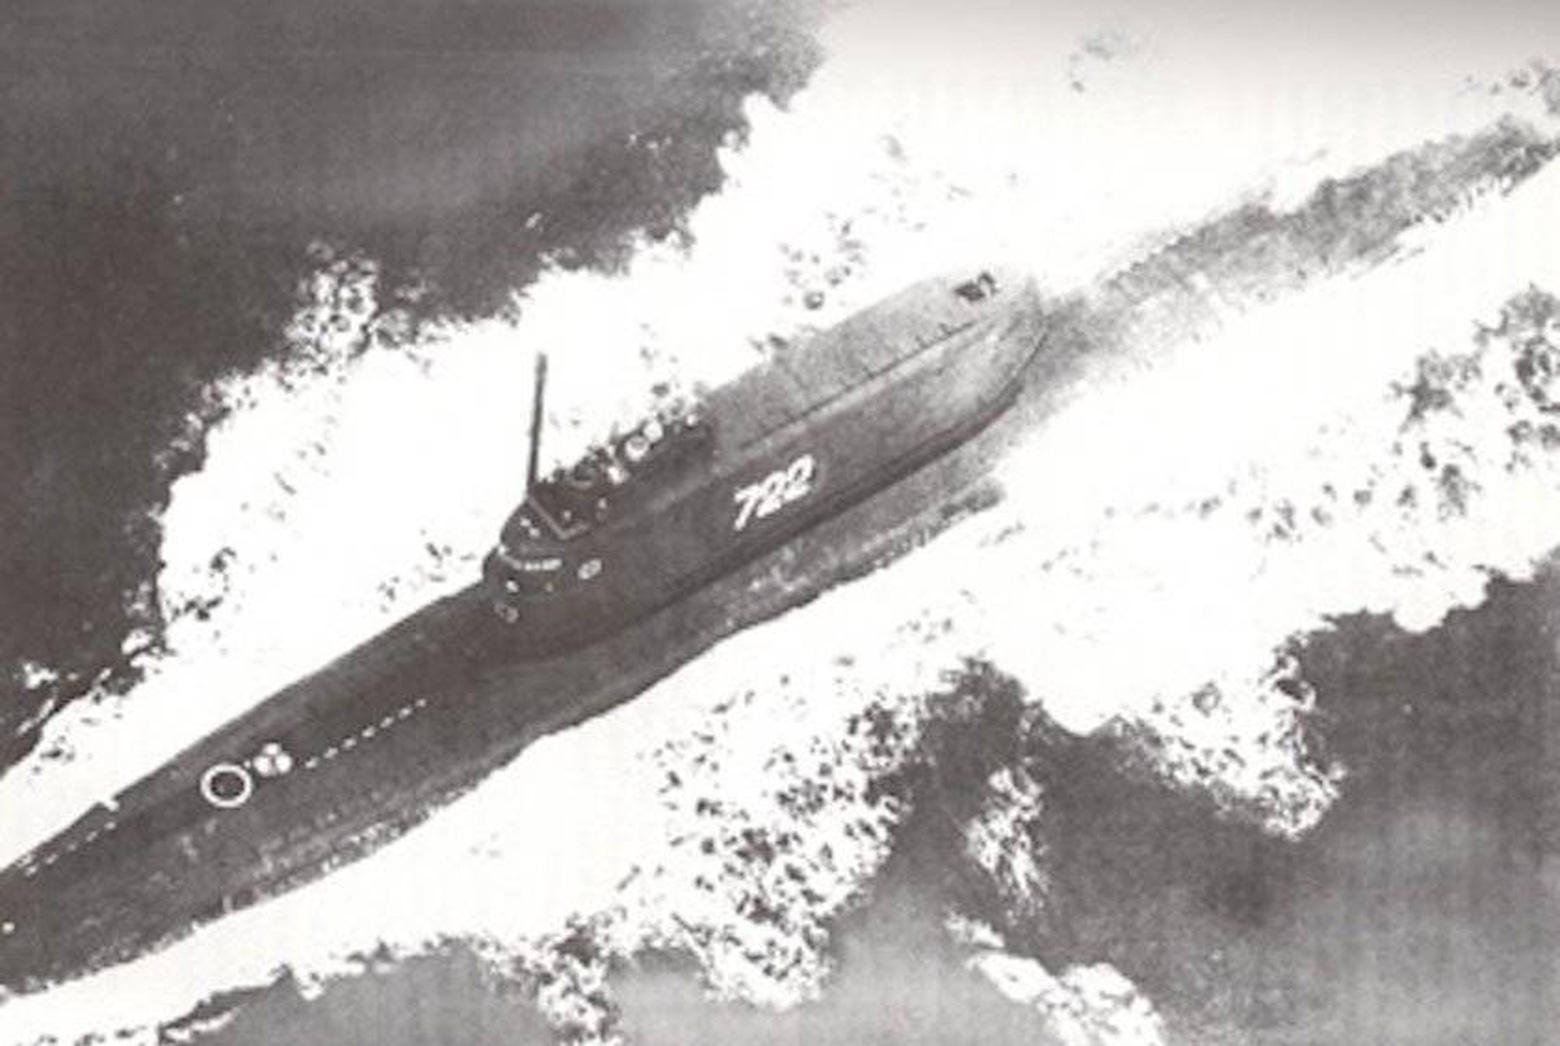 The submarine K-129